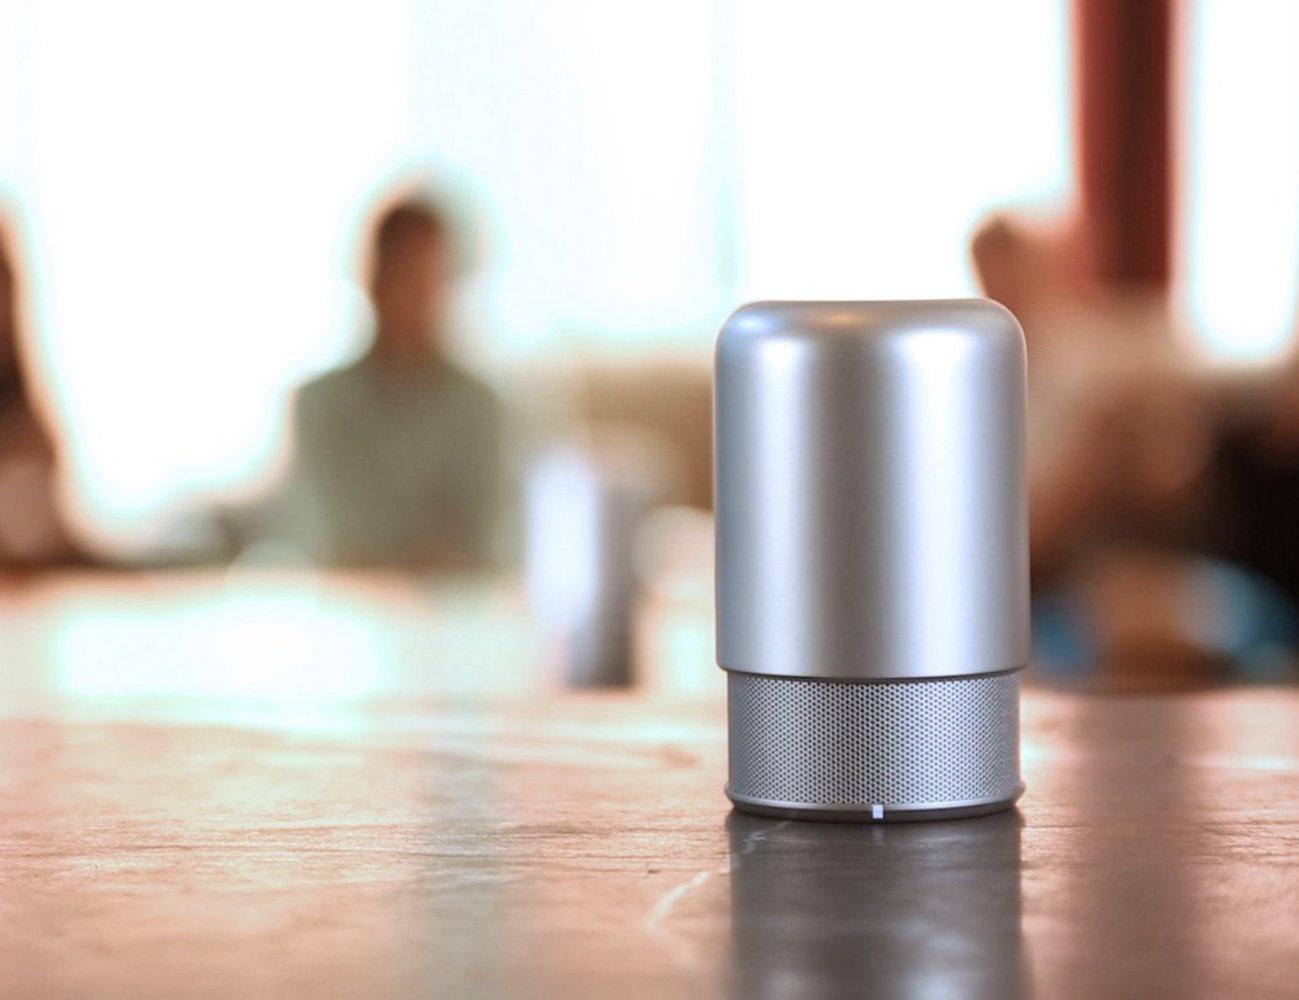 HiddenRadio2 Wireless Bluetooth Speaker